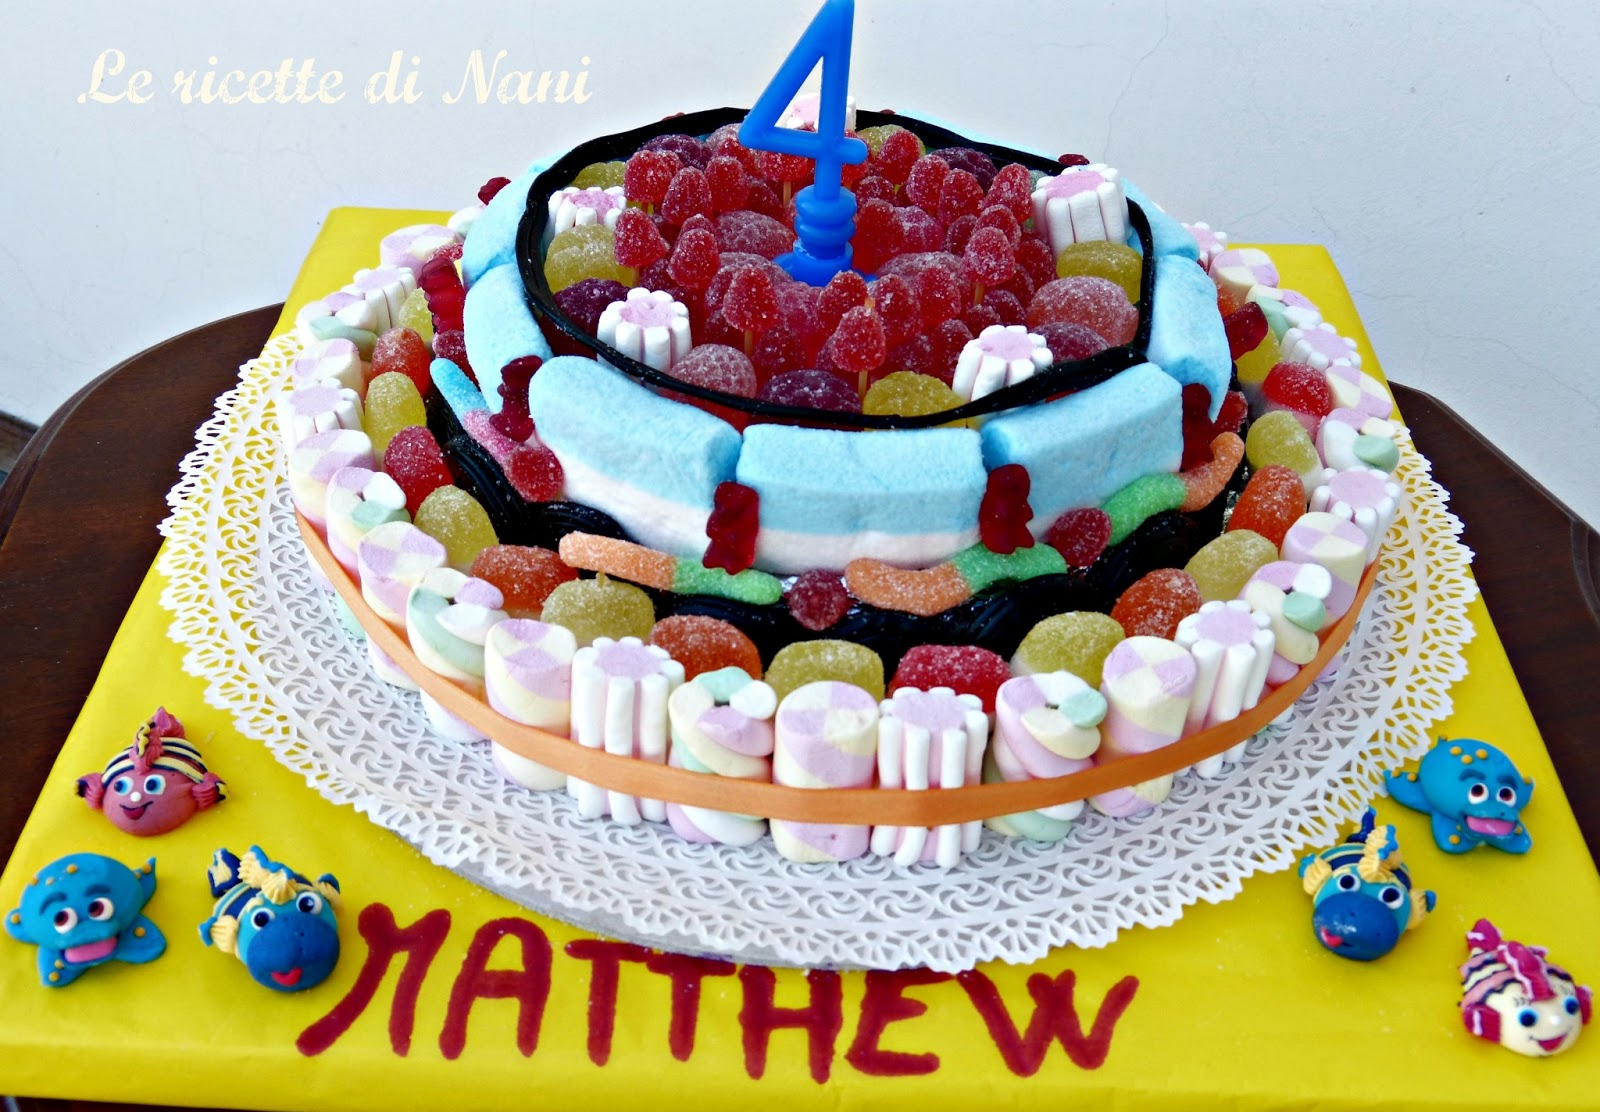 Le ricette di nani una coloratissima torta di caramelle - Casa di caramelle ...